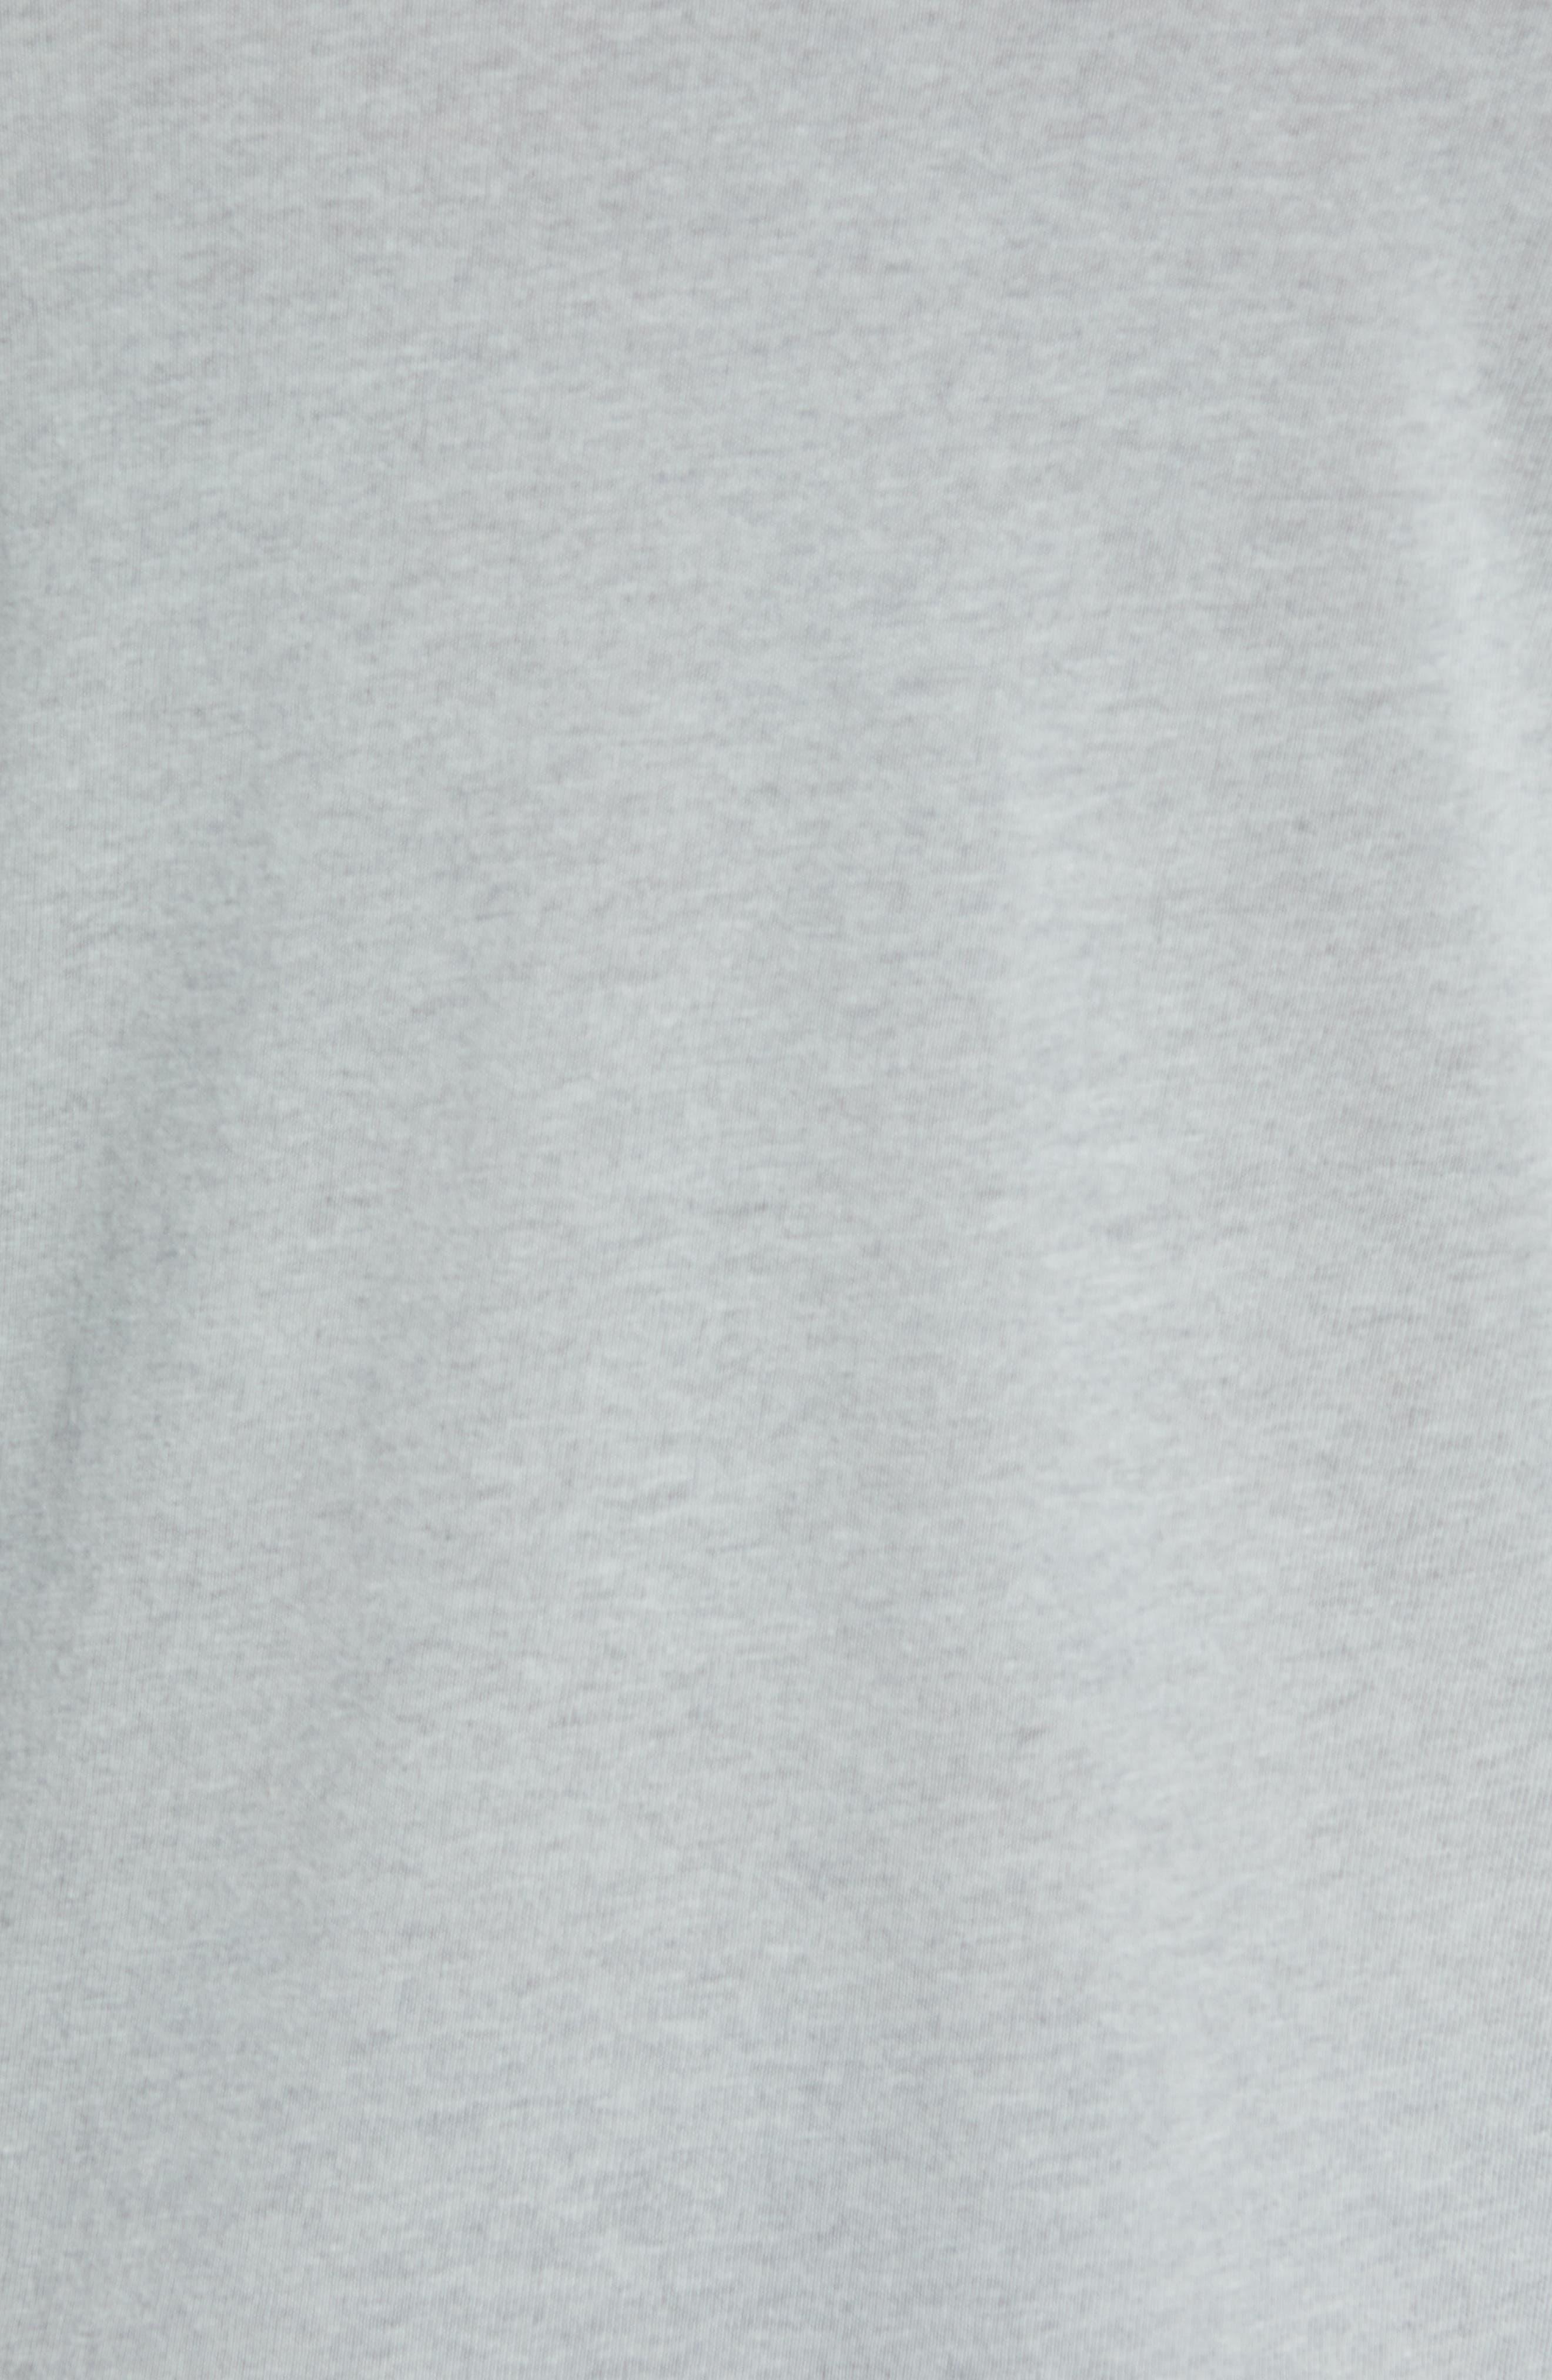 White Rock T-Shirt,                             Alternate thumbnail 5, color,                             LIGHT GREY